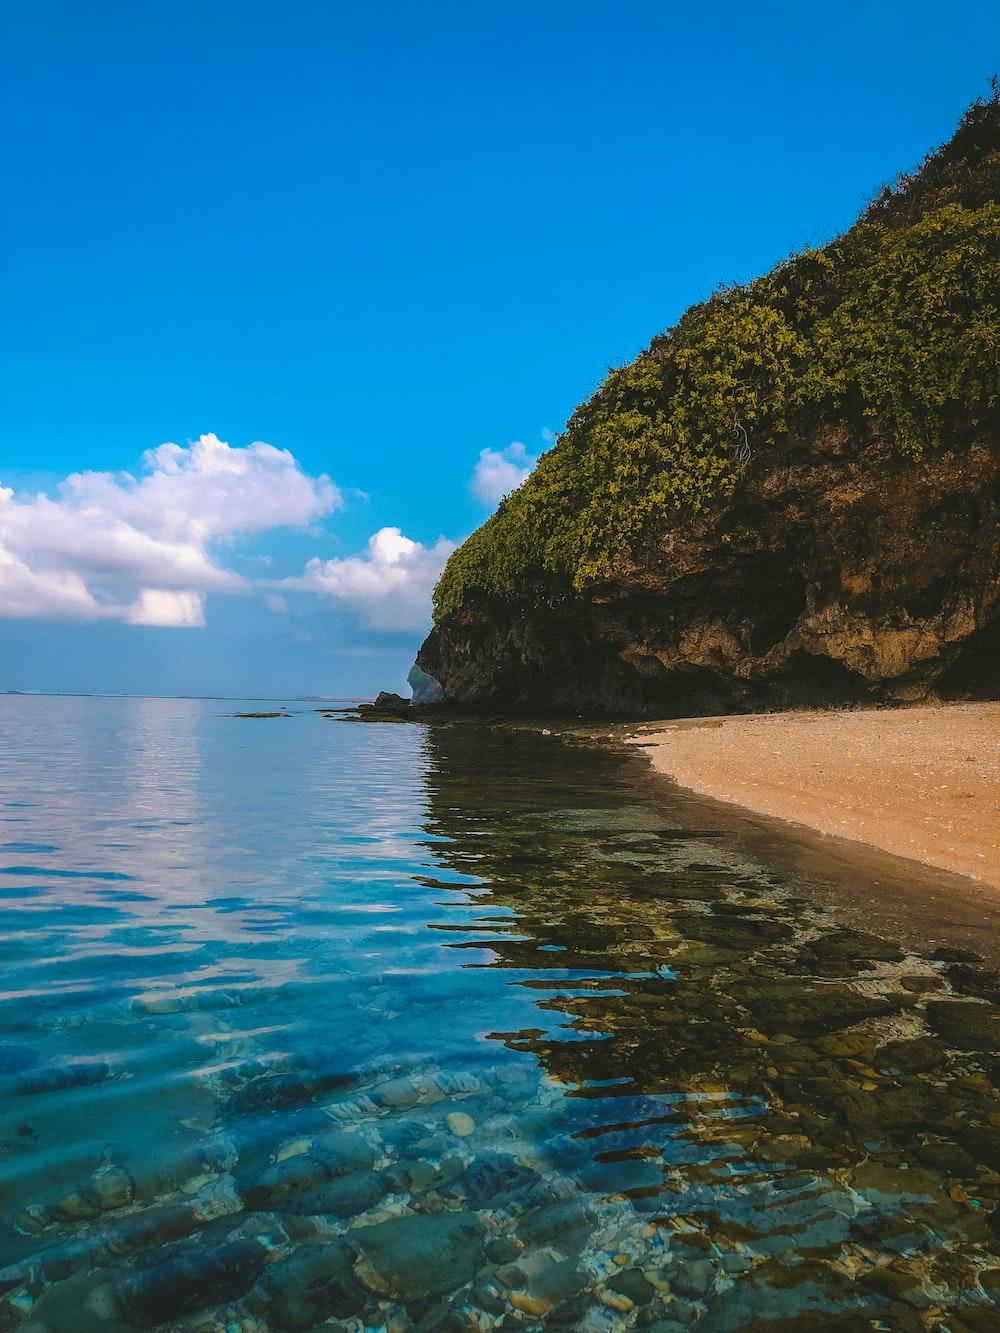 island and sea under blue sky